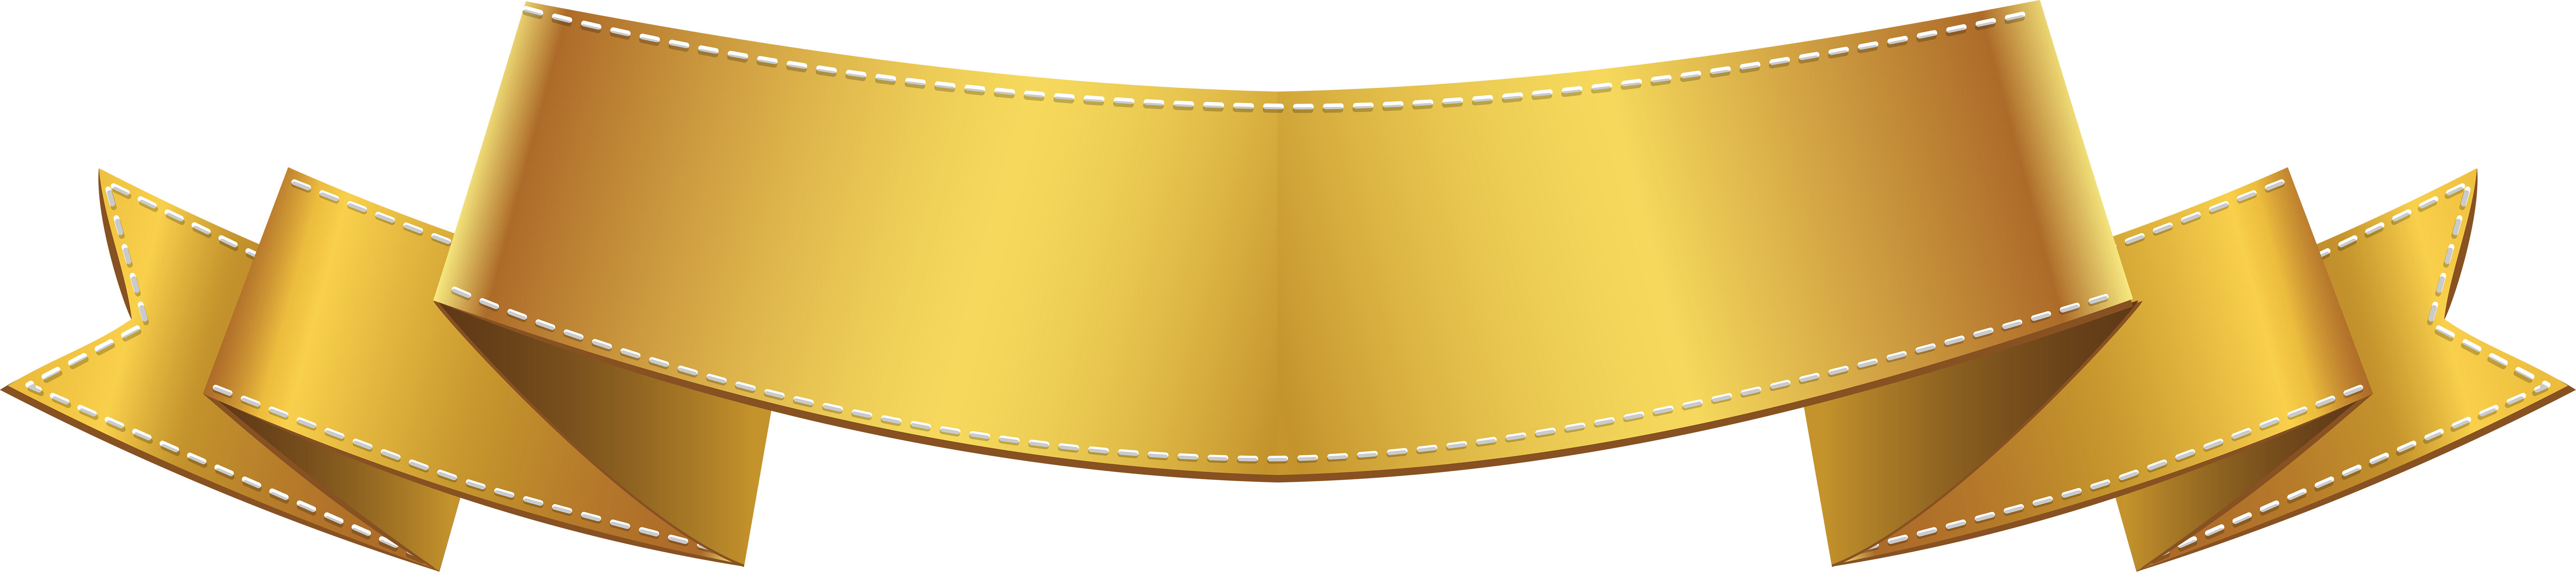 freeuse Banner clip art png. Golden clipart